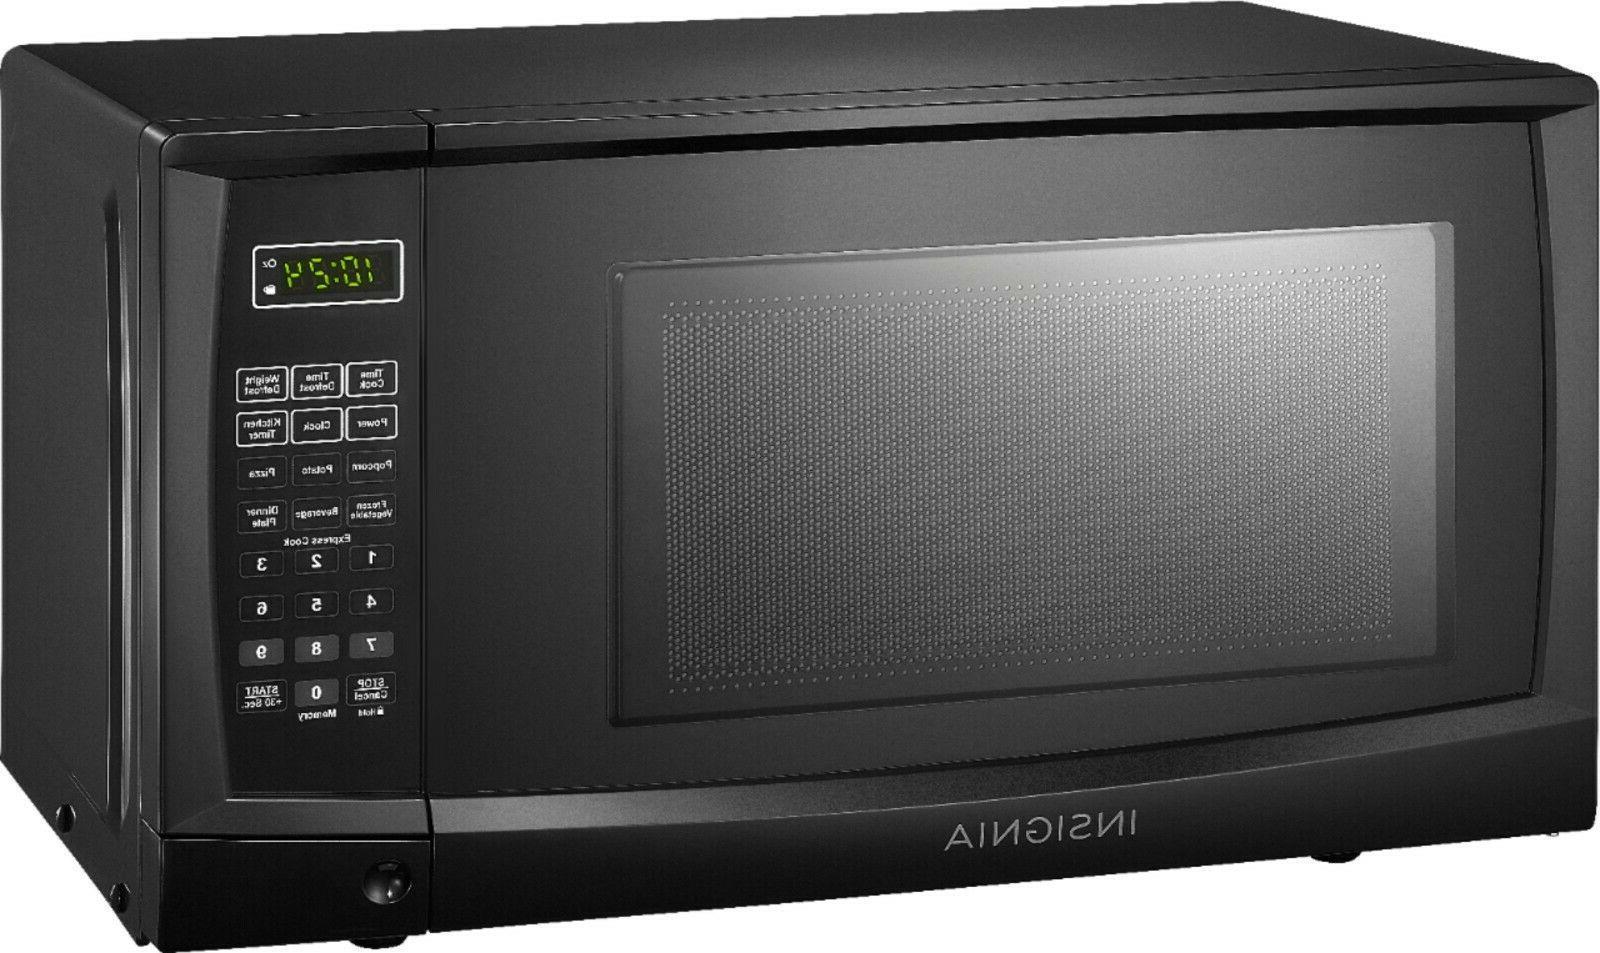 Microwave 0.7 Countertop Black Electronic Controls